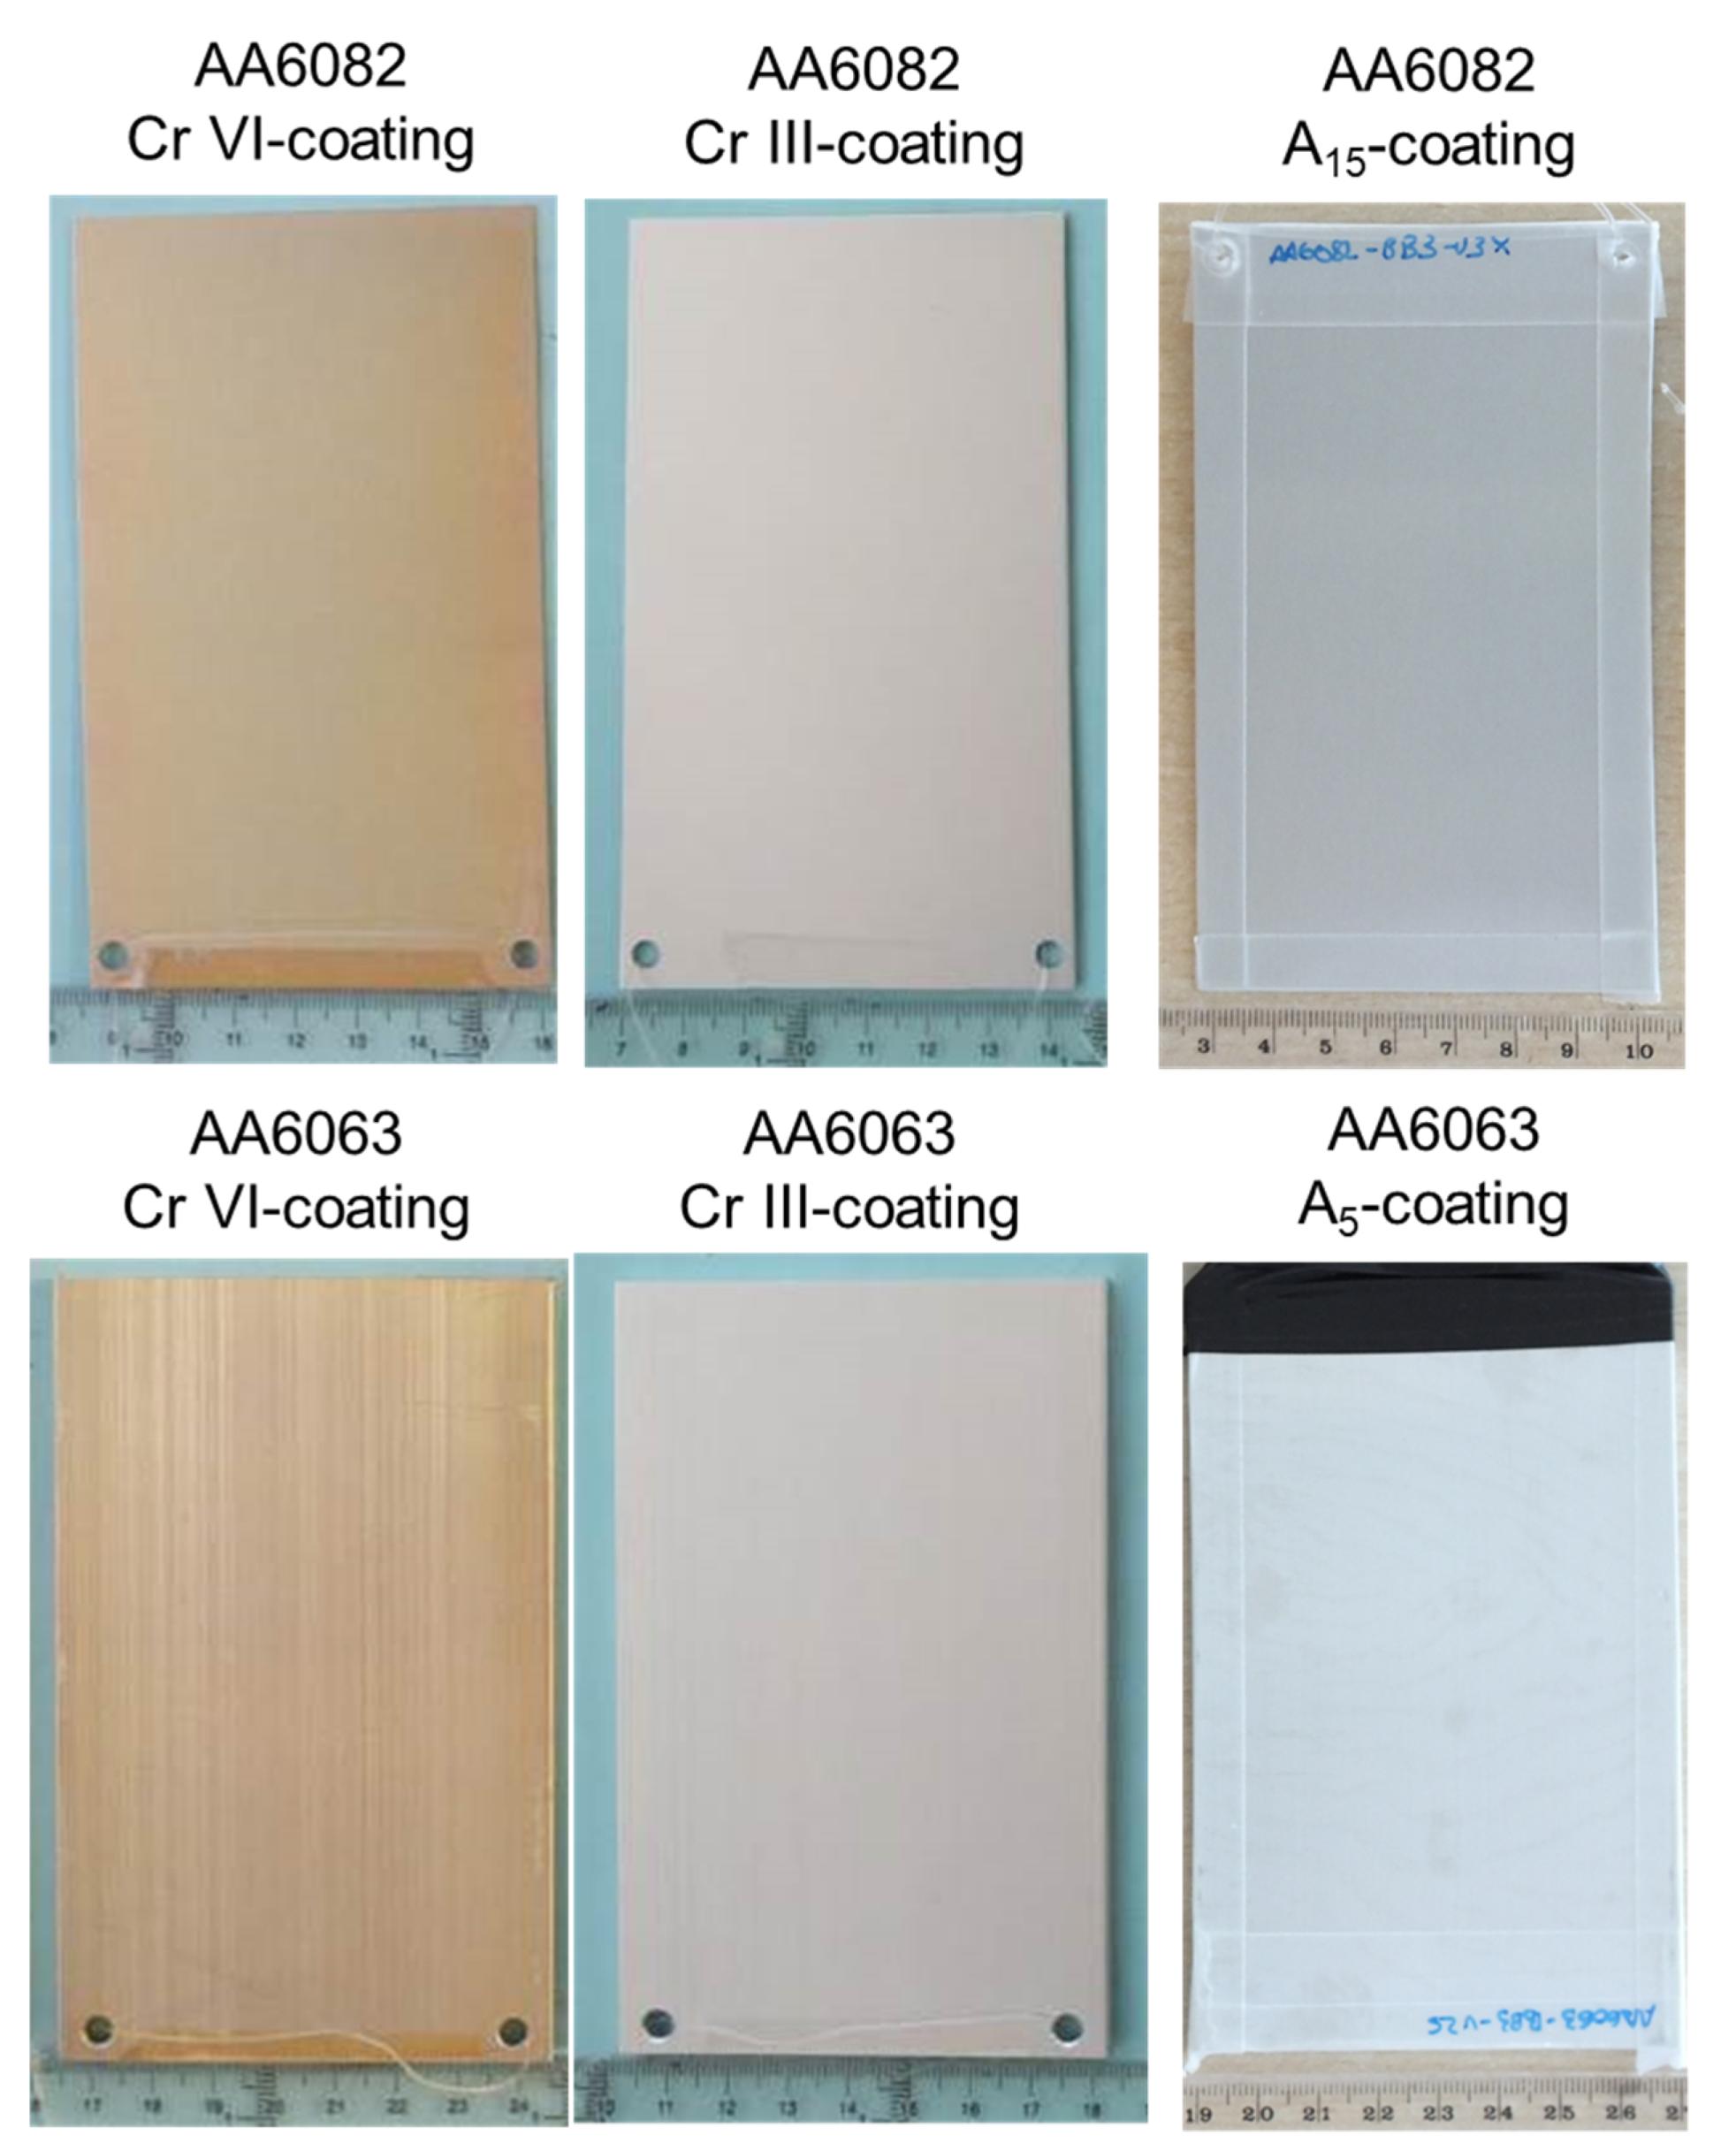 72L x 1W x 1//8T Clear Anodized Aluminum Angle 6063 Alloy T-6 Temper